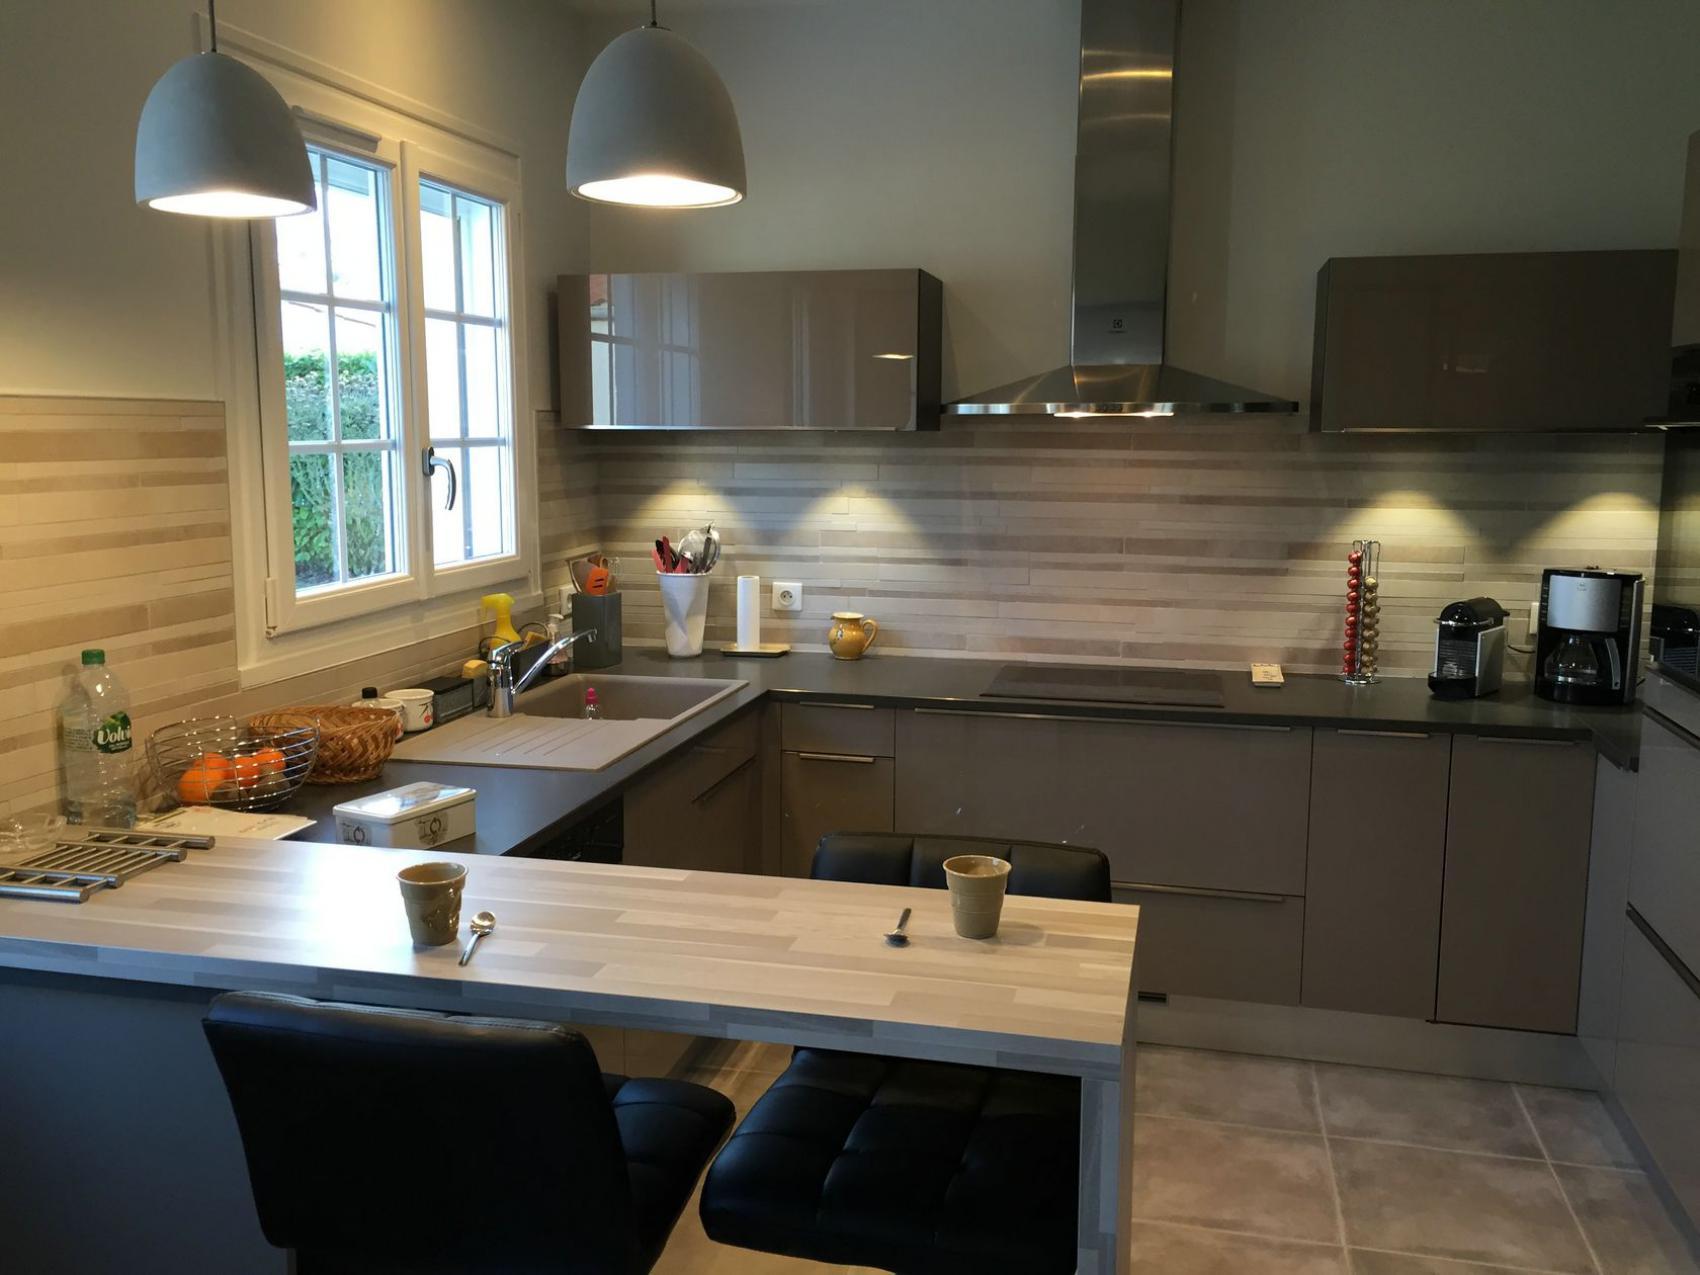 cuisine avec verri re bk71 jornalagora. Black Bedroom Furniture Sets. Home Design Ideas